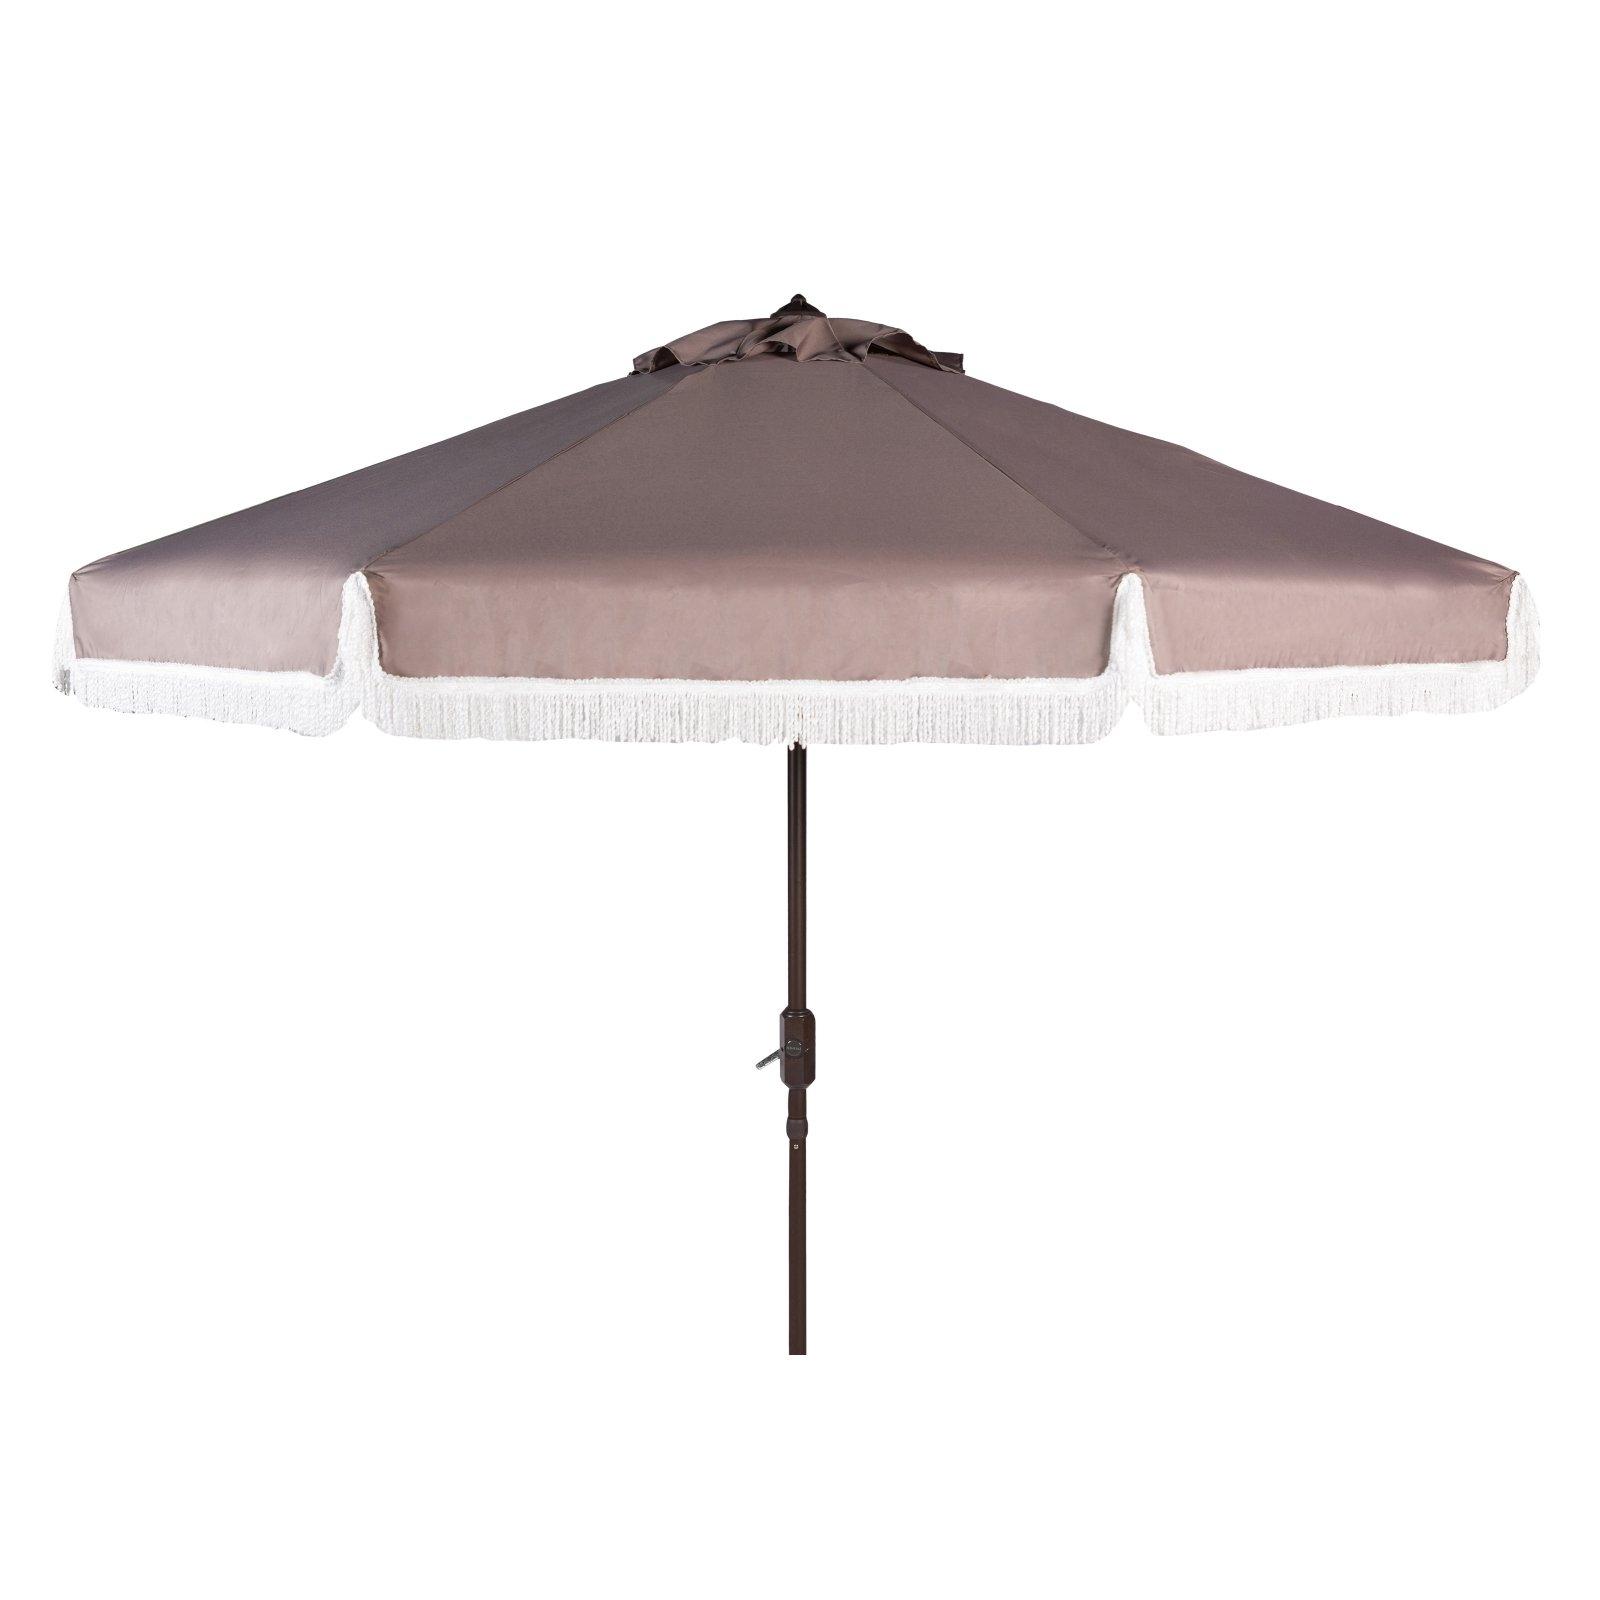 Safavieh Milan Fringe 9' Crank Outdoor Umbrella, Multiple Colors For Trendy Vinyl Patio Umbrellas With Fringe (View 13 of 20)